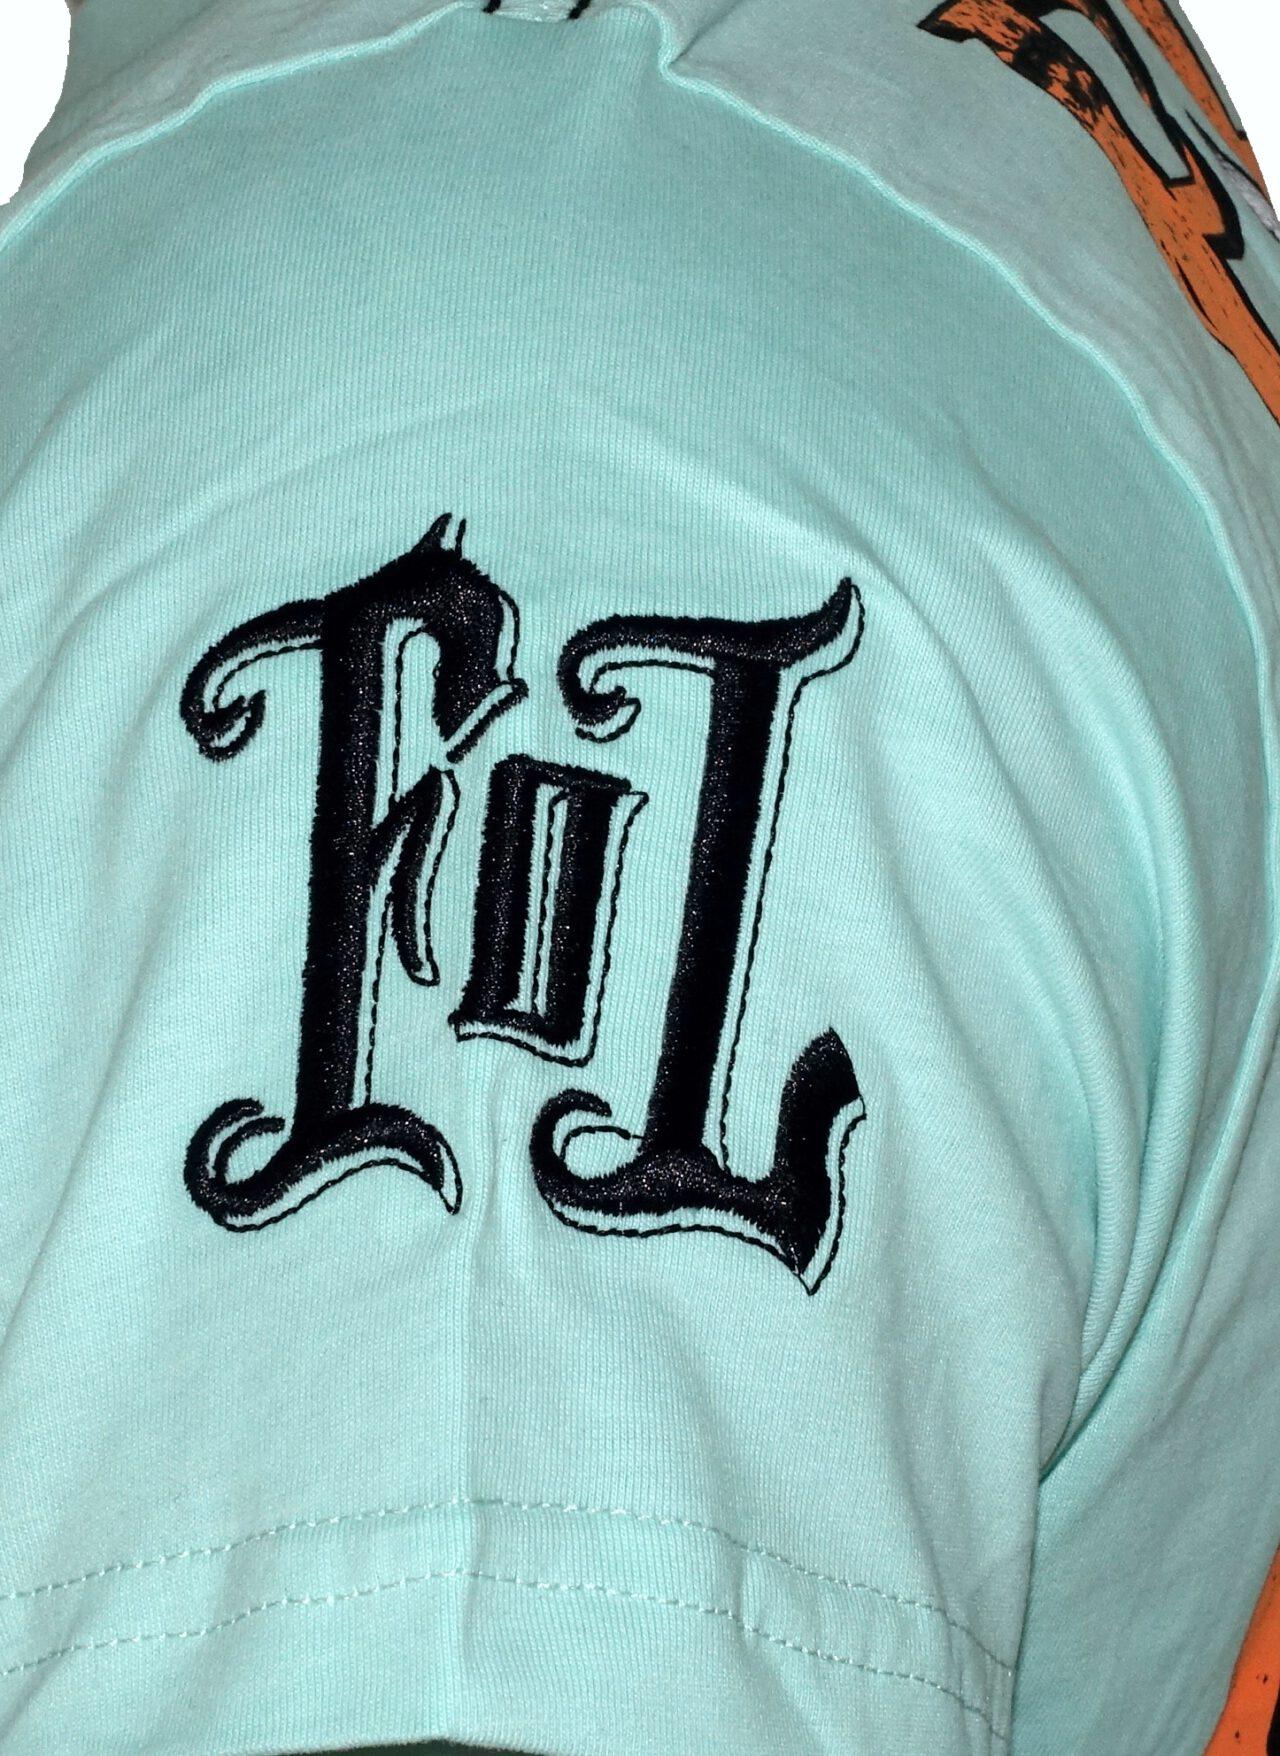 Fact of Life T-Shirt TS-29 mint